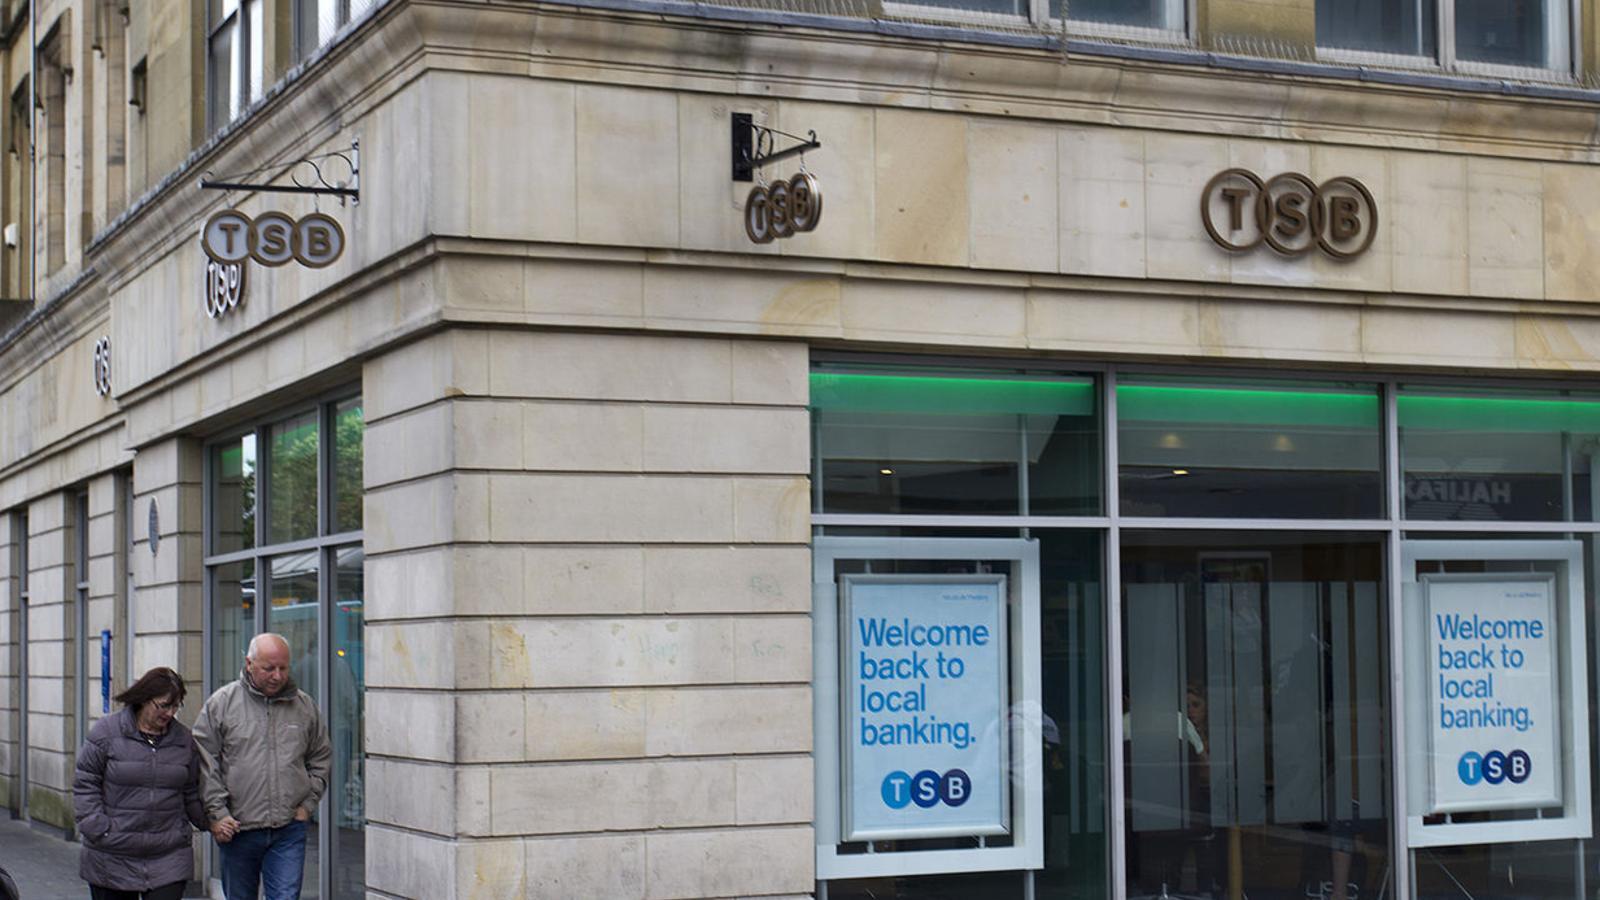 El banc sabadell presenta una oferta pel brit nic tsb - Oficinas banc sabadell ...